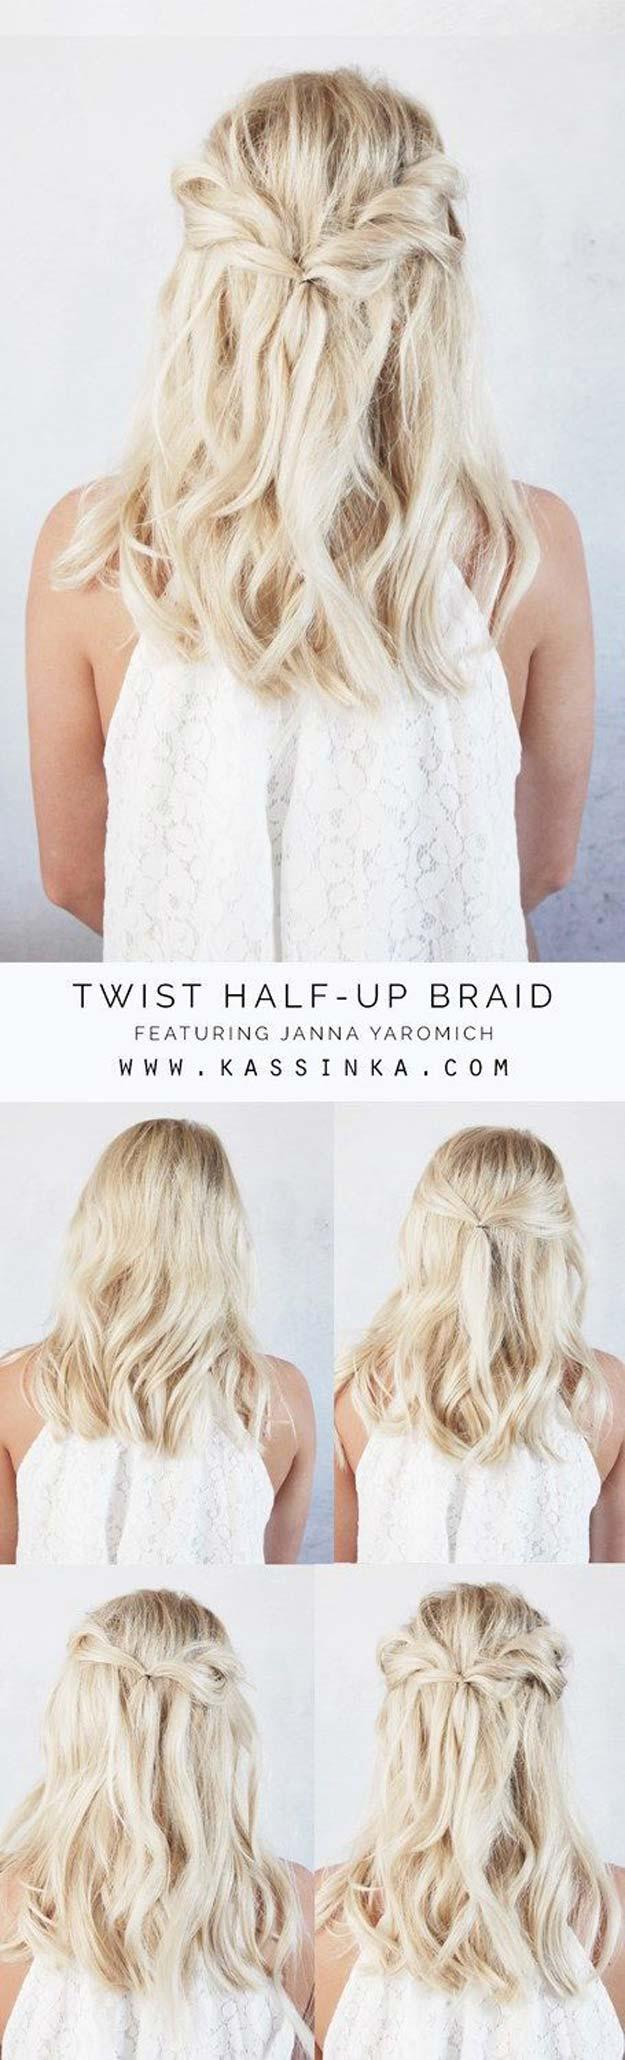 Pin by Rae Harris on Hair Styles | Pinterest | Hair style